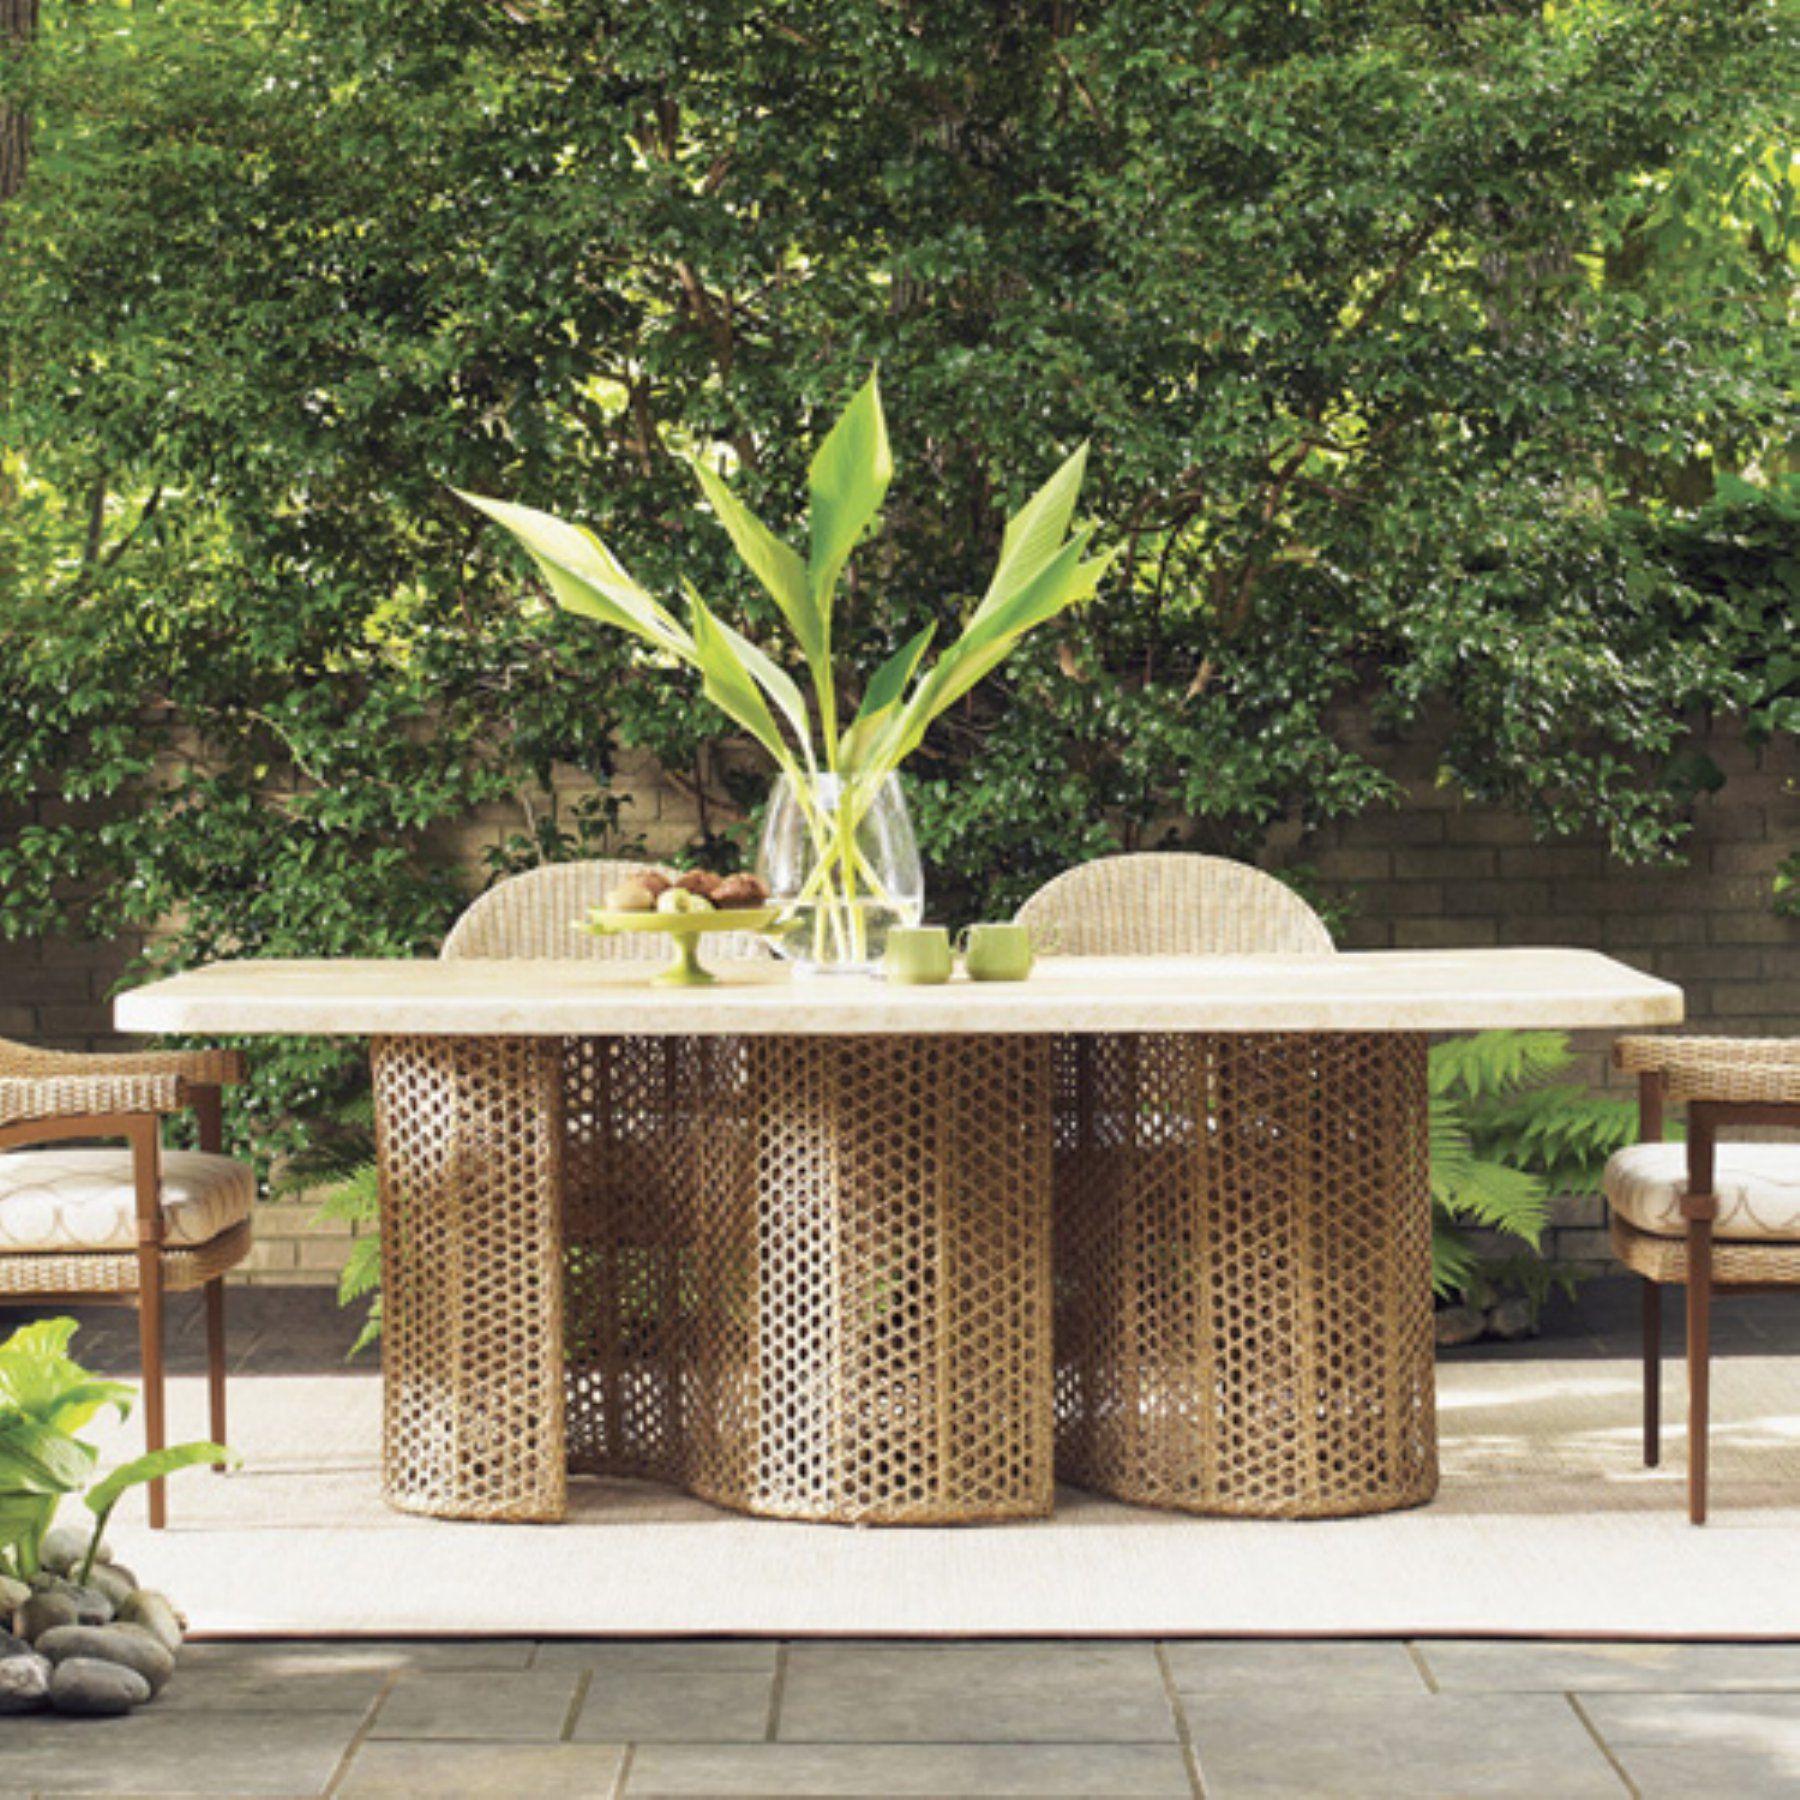 Outdoor tommy bahama aviano rectangular wicker patio dining table